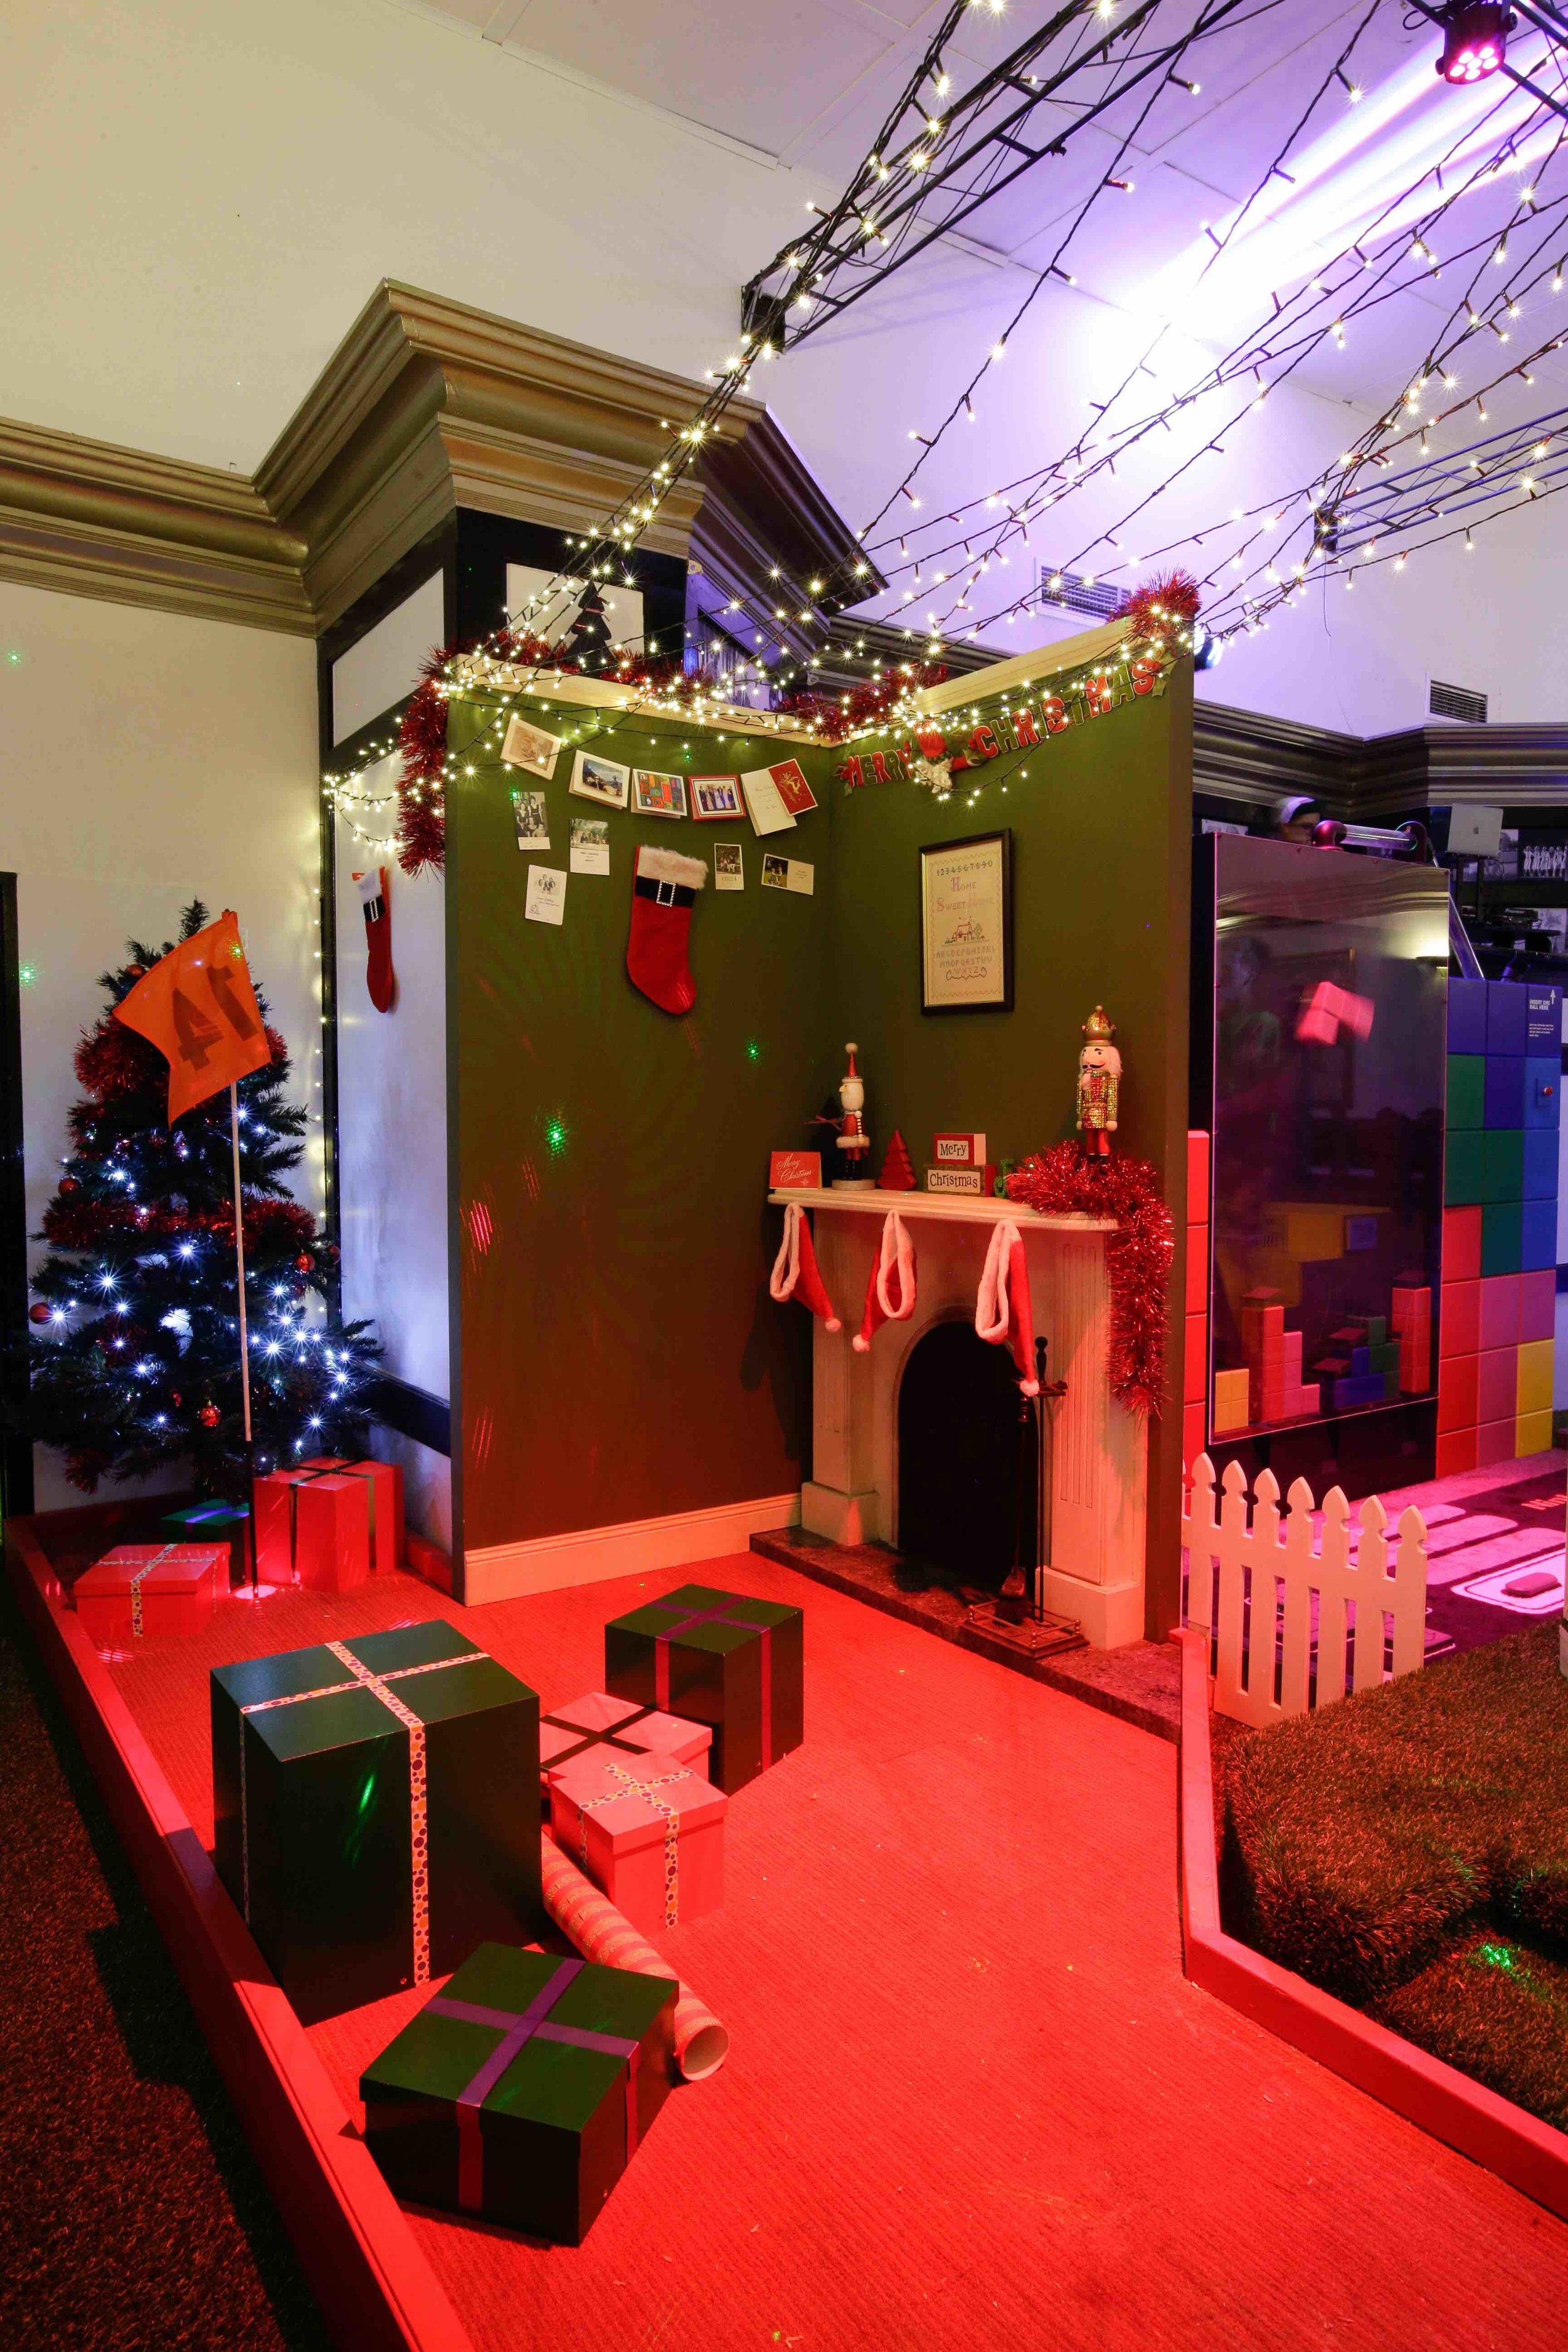 holey-moley-golf-club-launch-2017-interior-o-christmas-tree-2.jpeg